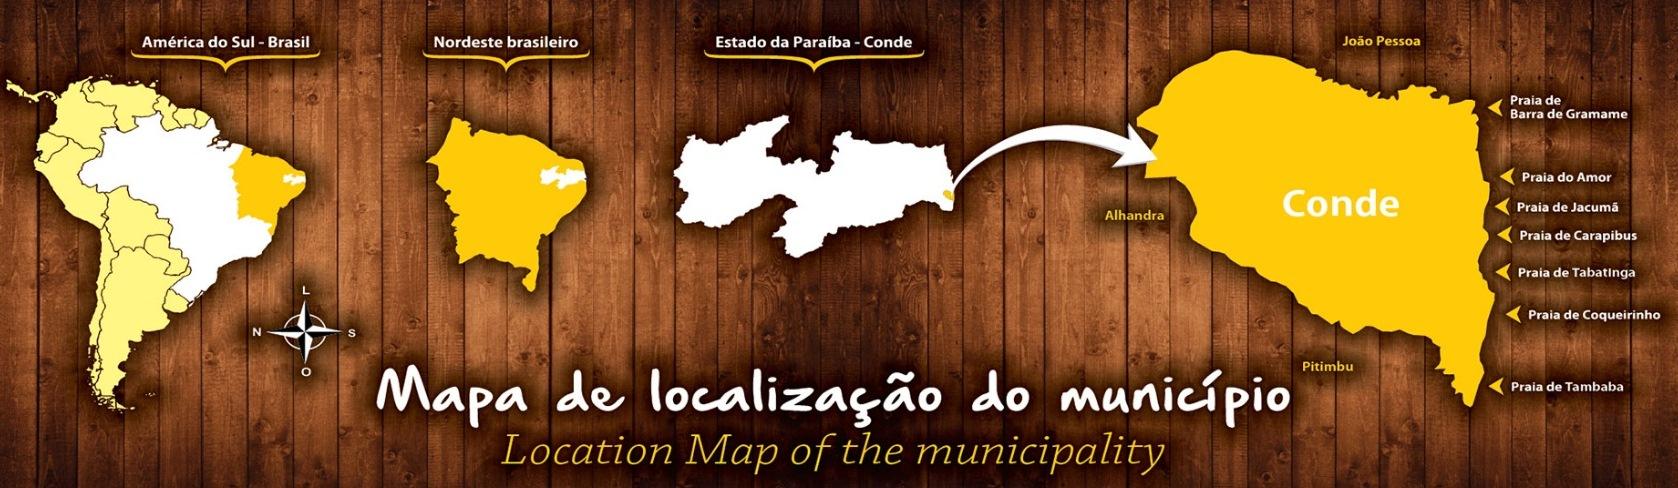 Carapibus - http://www.costadocondepb.com.br